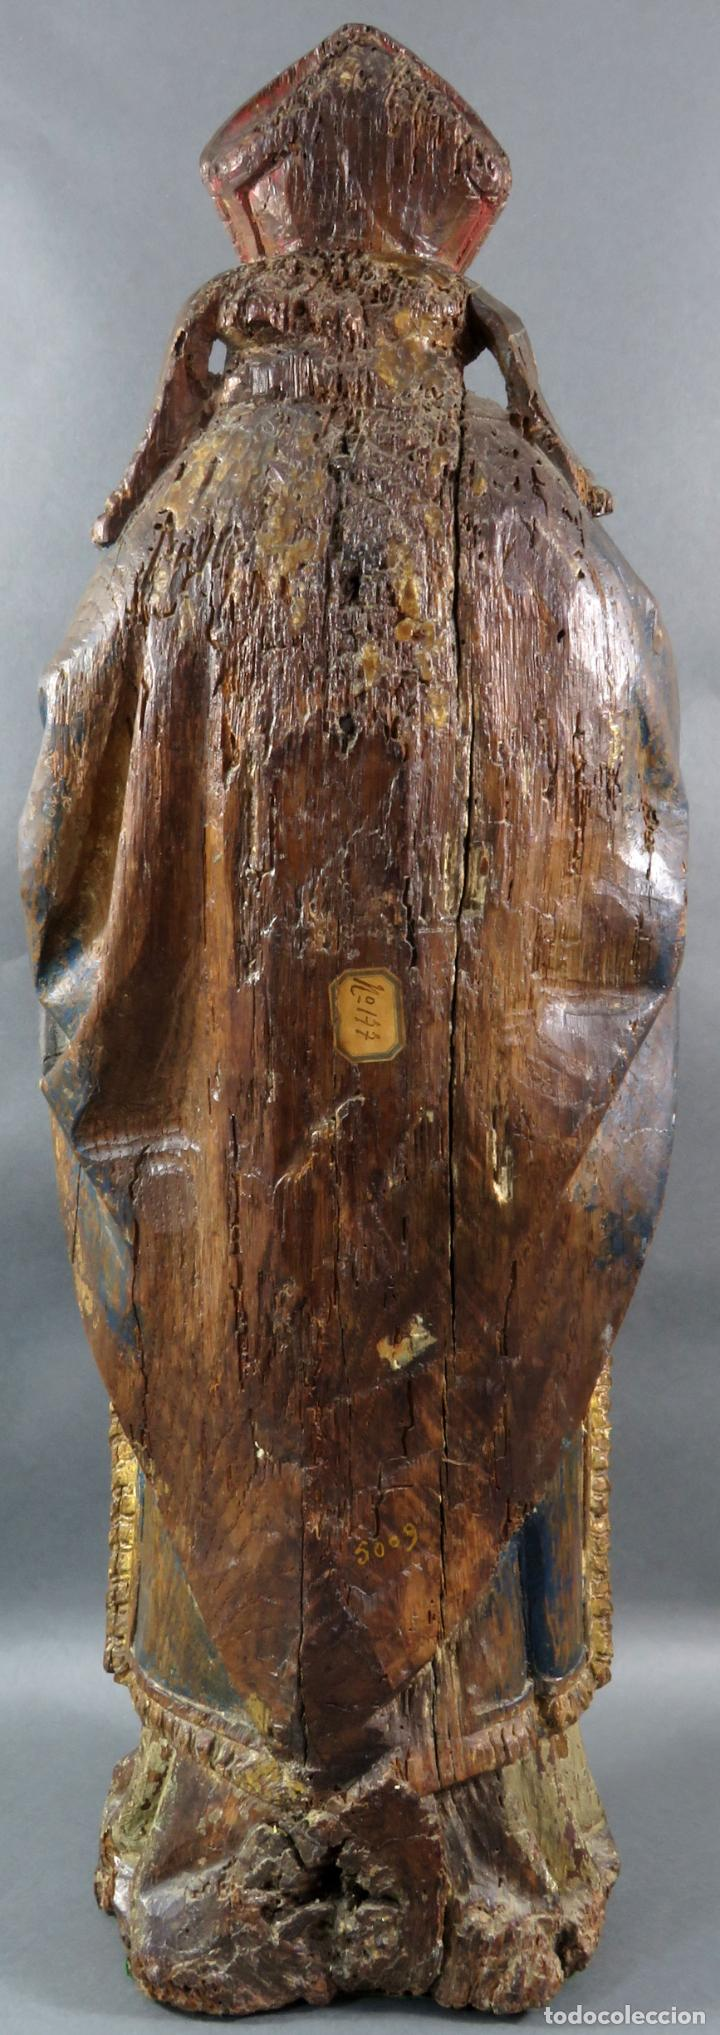 Arte: Talla obispo bendiciendo en madera tallada policromada circulo Alejo de Baiha principios siglo XVI - Foto 7 - 194787992